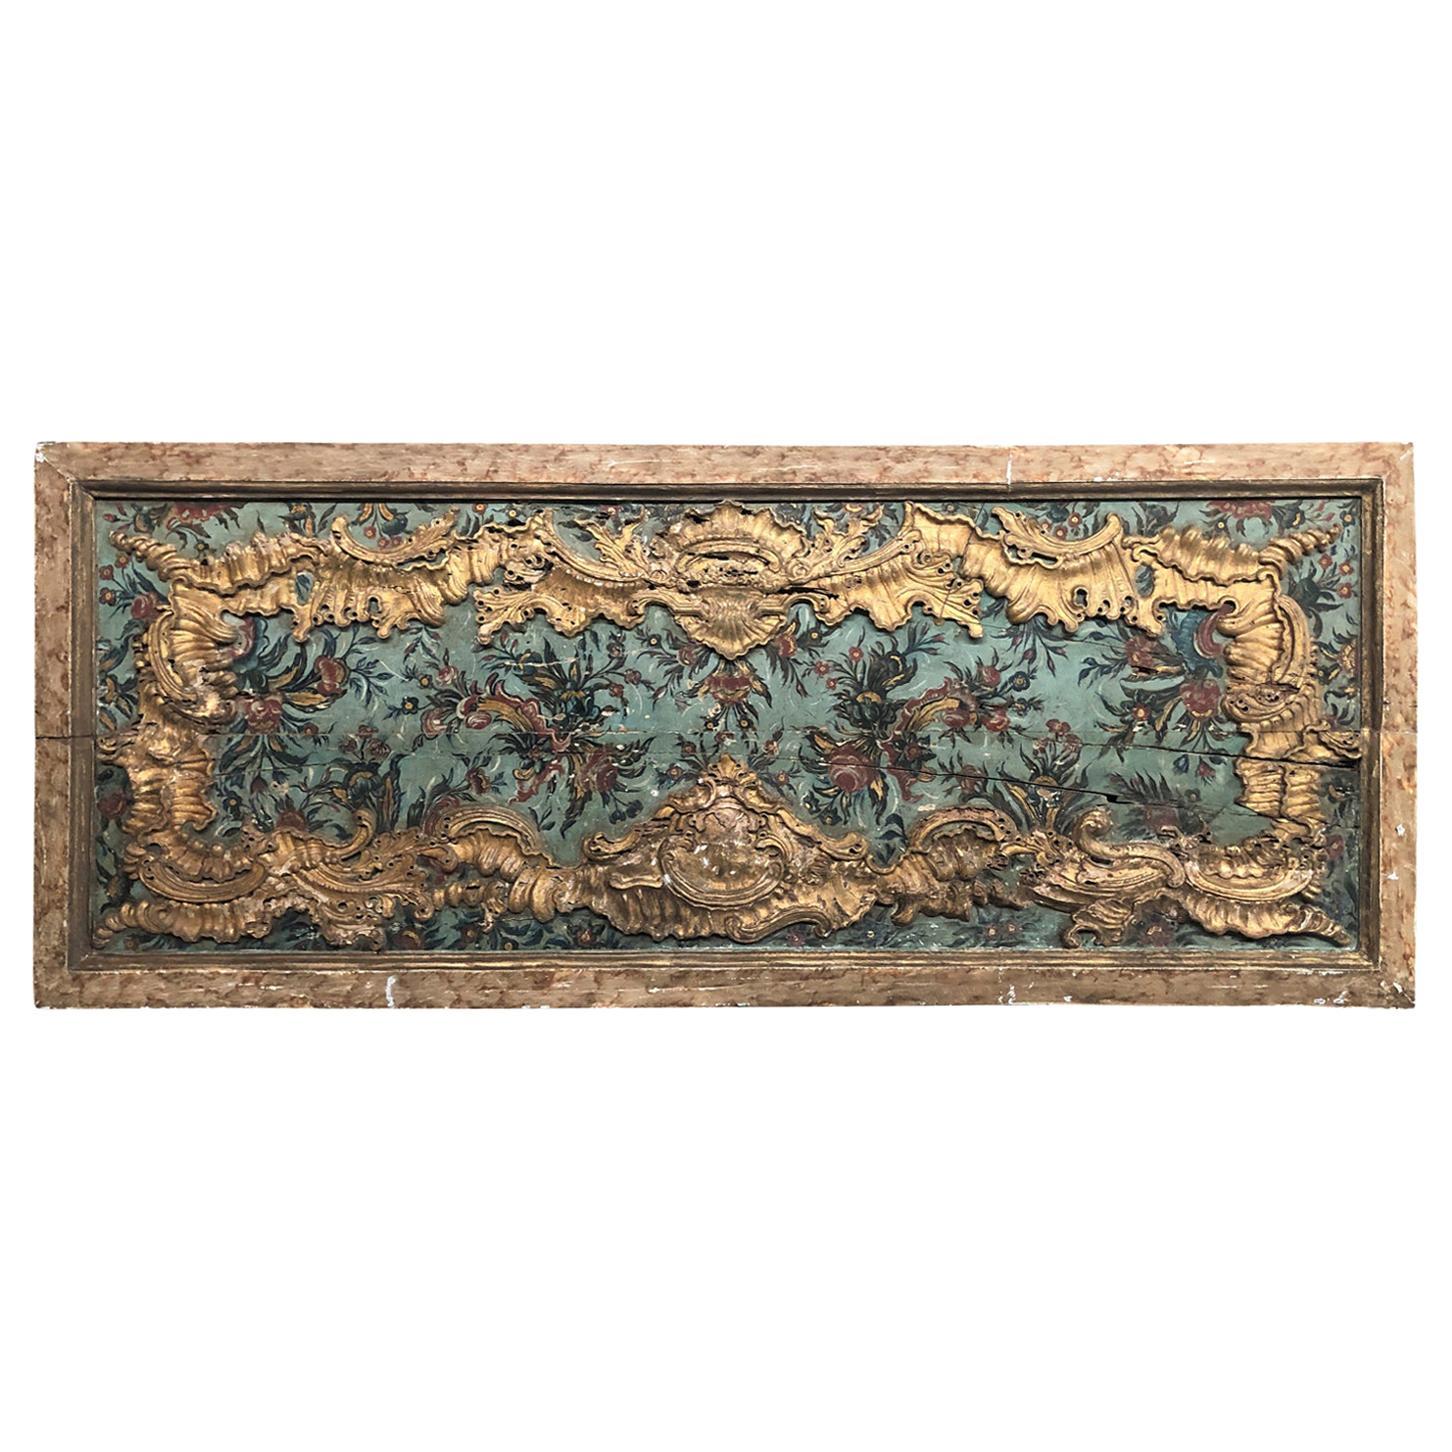 Portuguese 18th Century Boiserie Panel